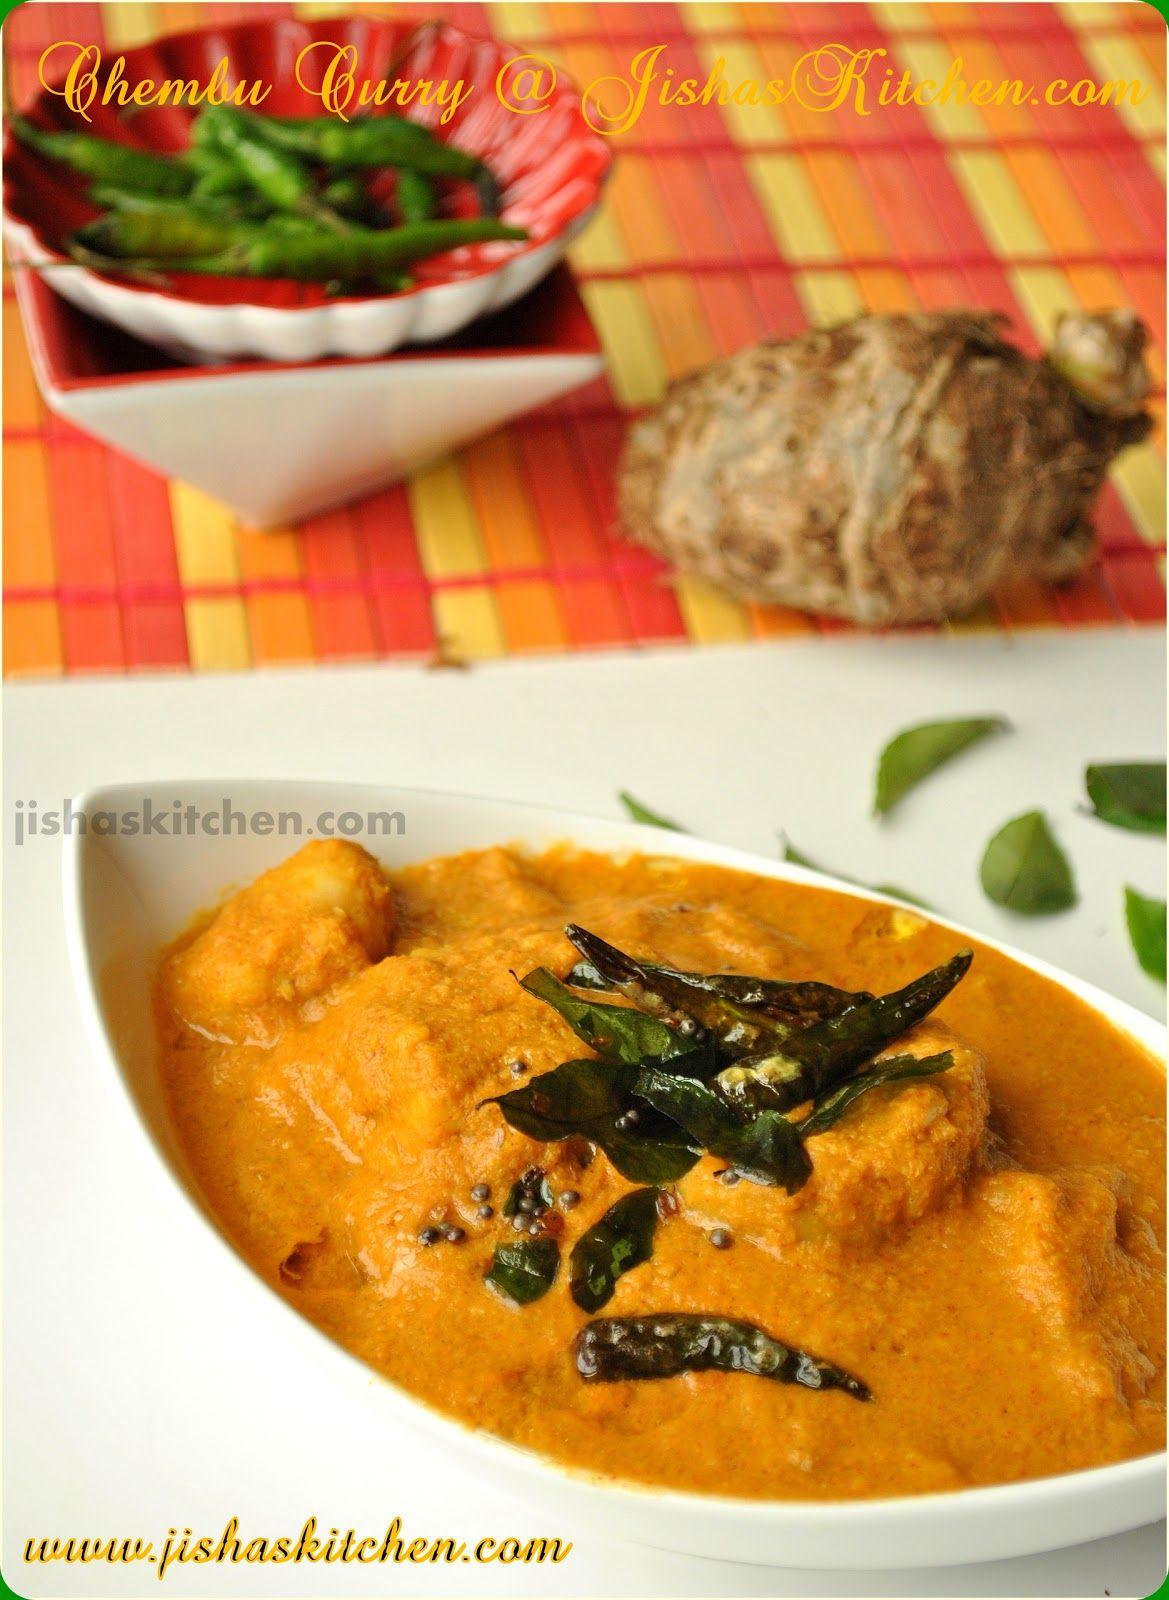 Jisha S Kitchen Chembu Curry Indian Recipes Kerala Nadan